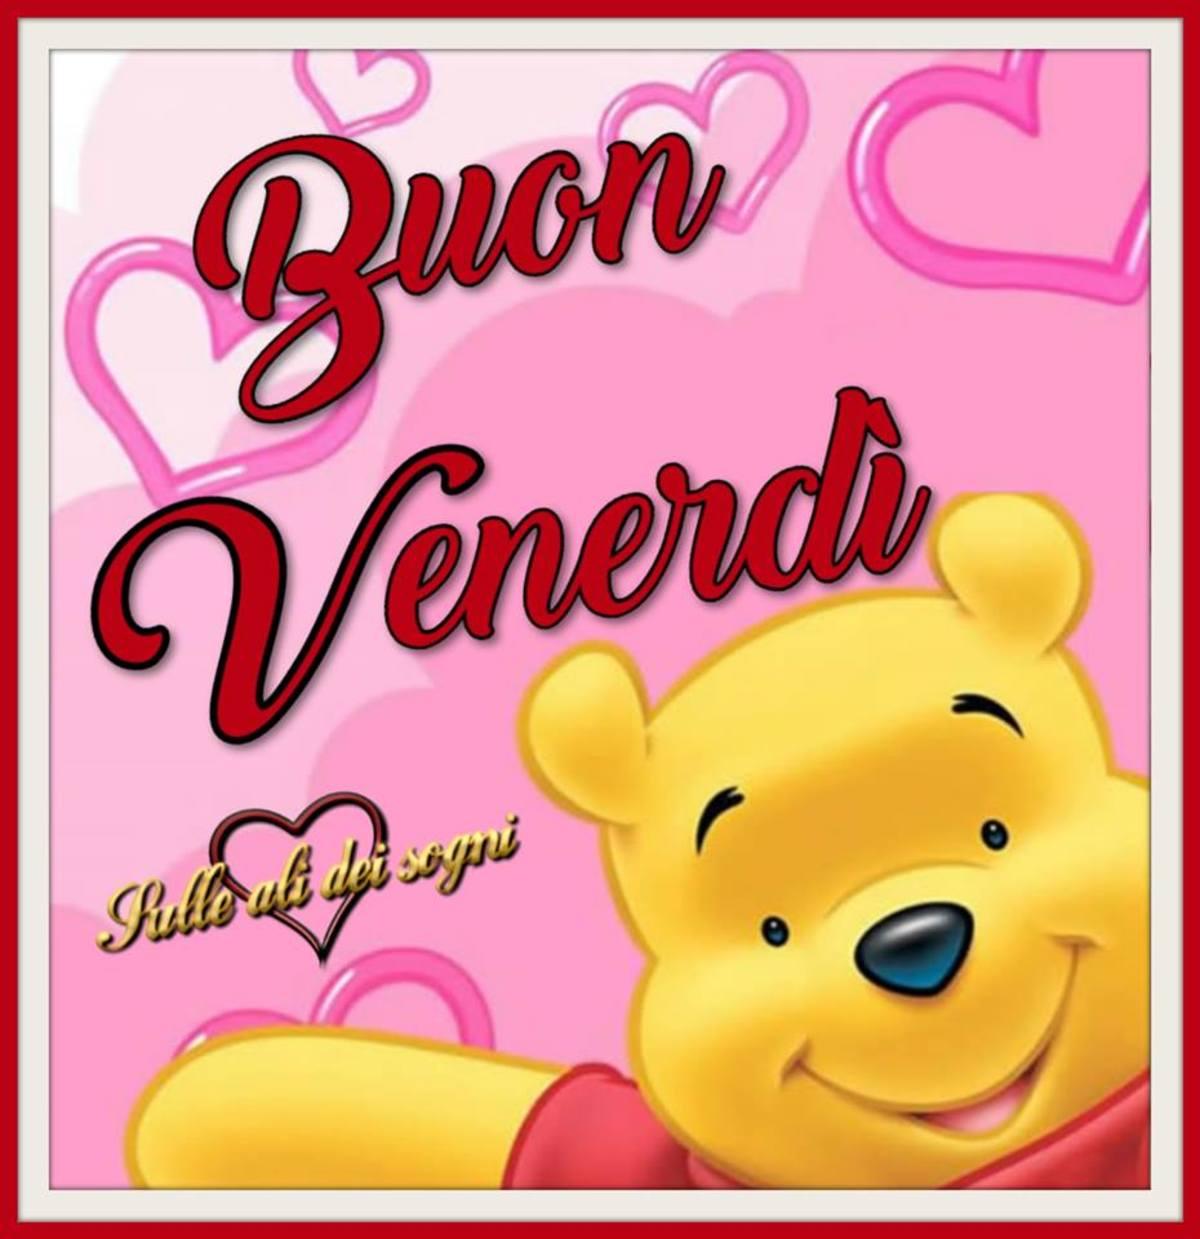 Immagini whatsapp buon venerd for Immagini divertenti venerdi